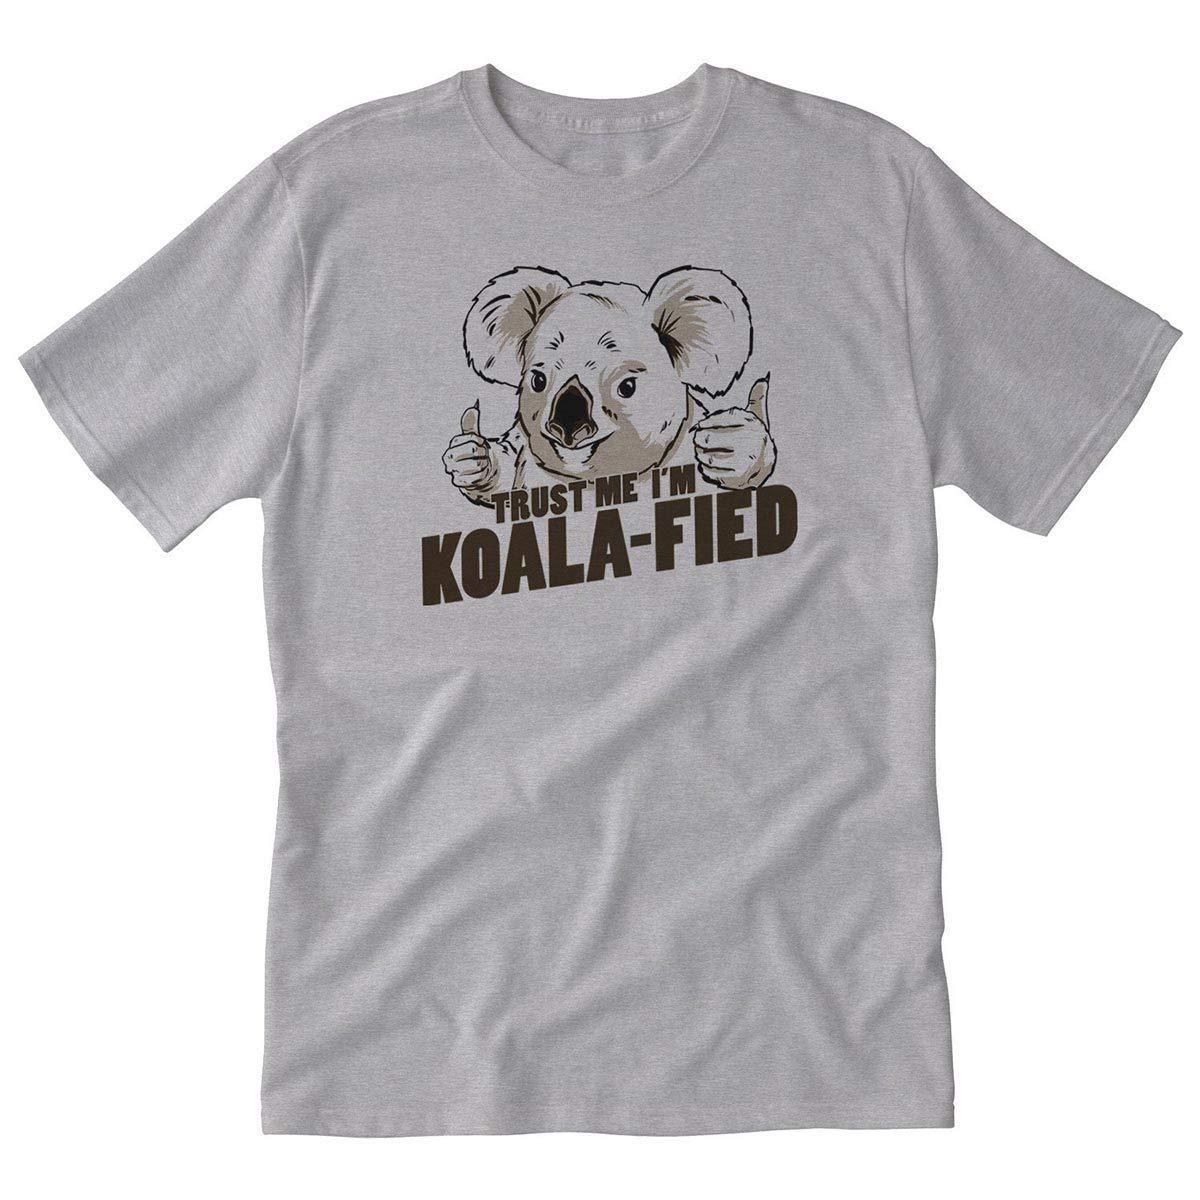 graceful shop Trust Me Im Koala-fied Adult Tshirt